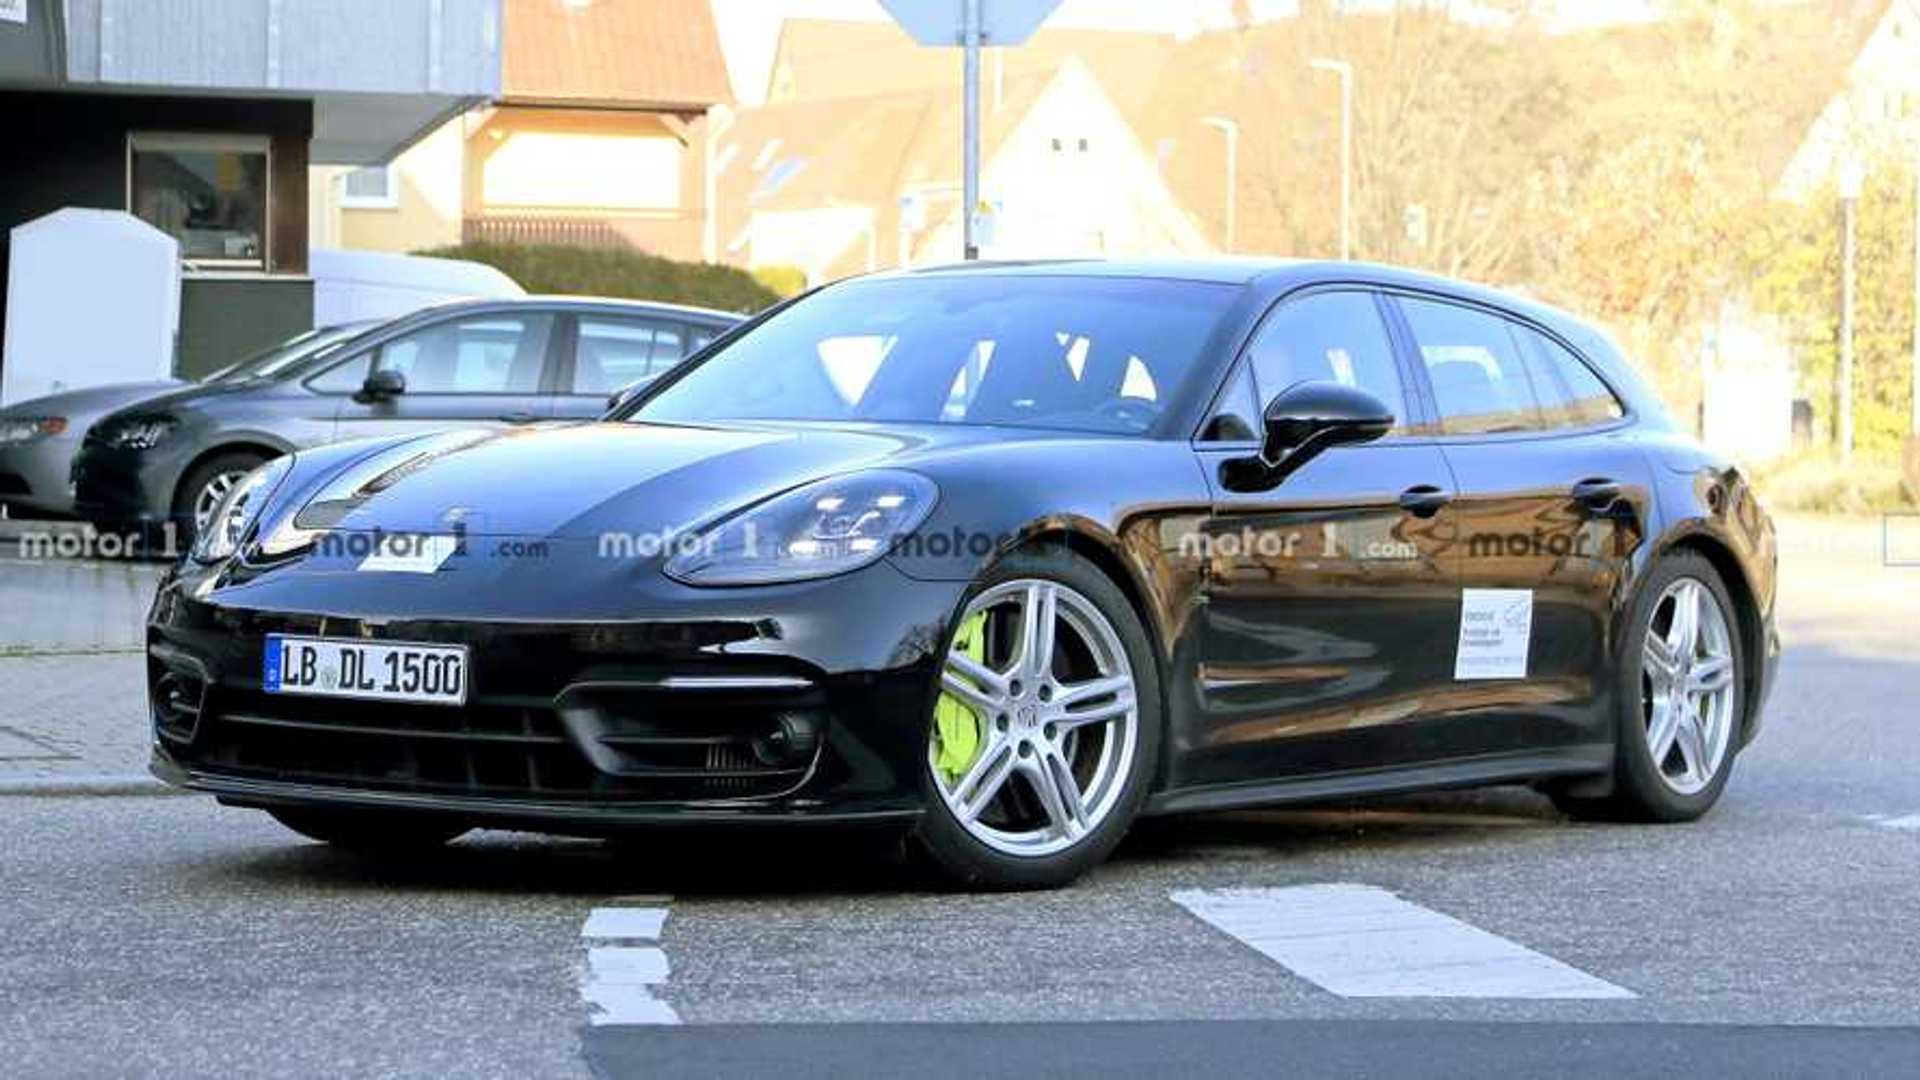 2020 - [Porsche] Panamera II restylée  Porsche-panamera-sport-turismo-facelift-spy-photo